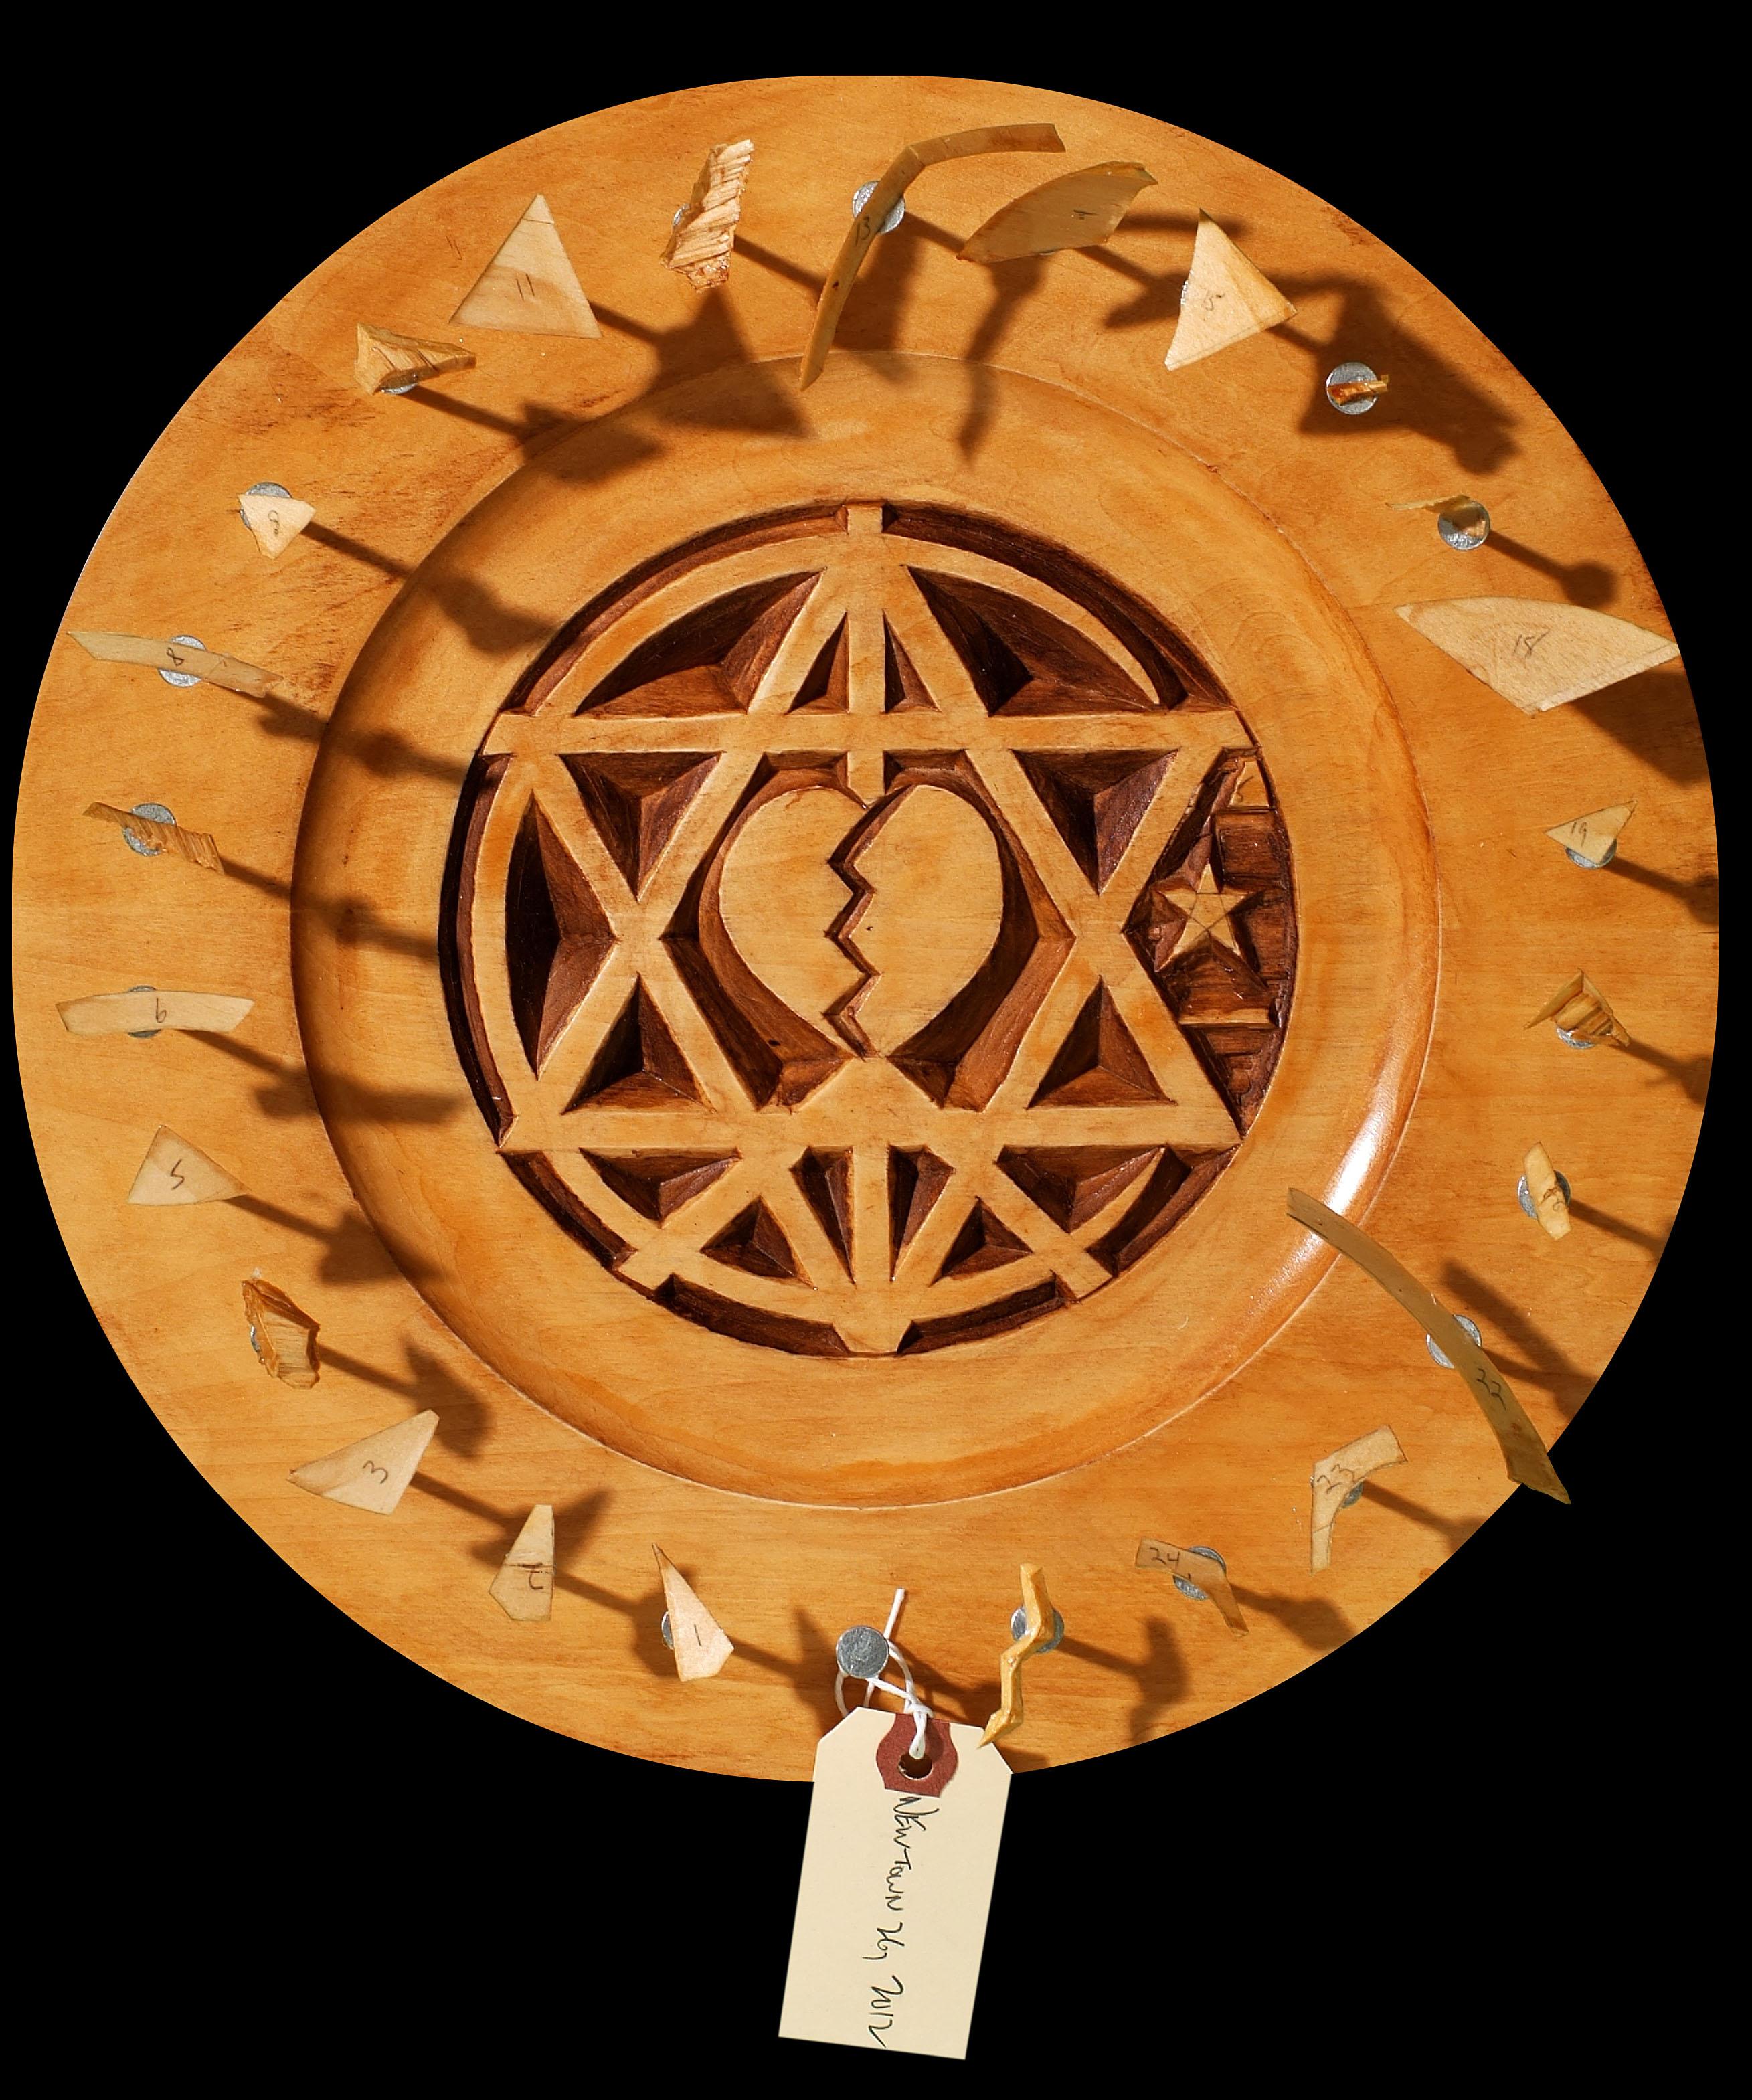 Jewish wood carving by harvey paris